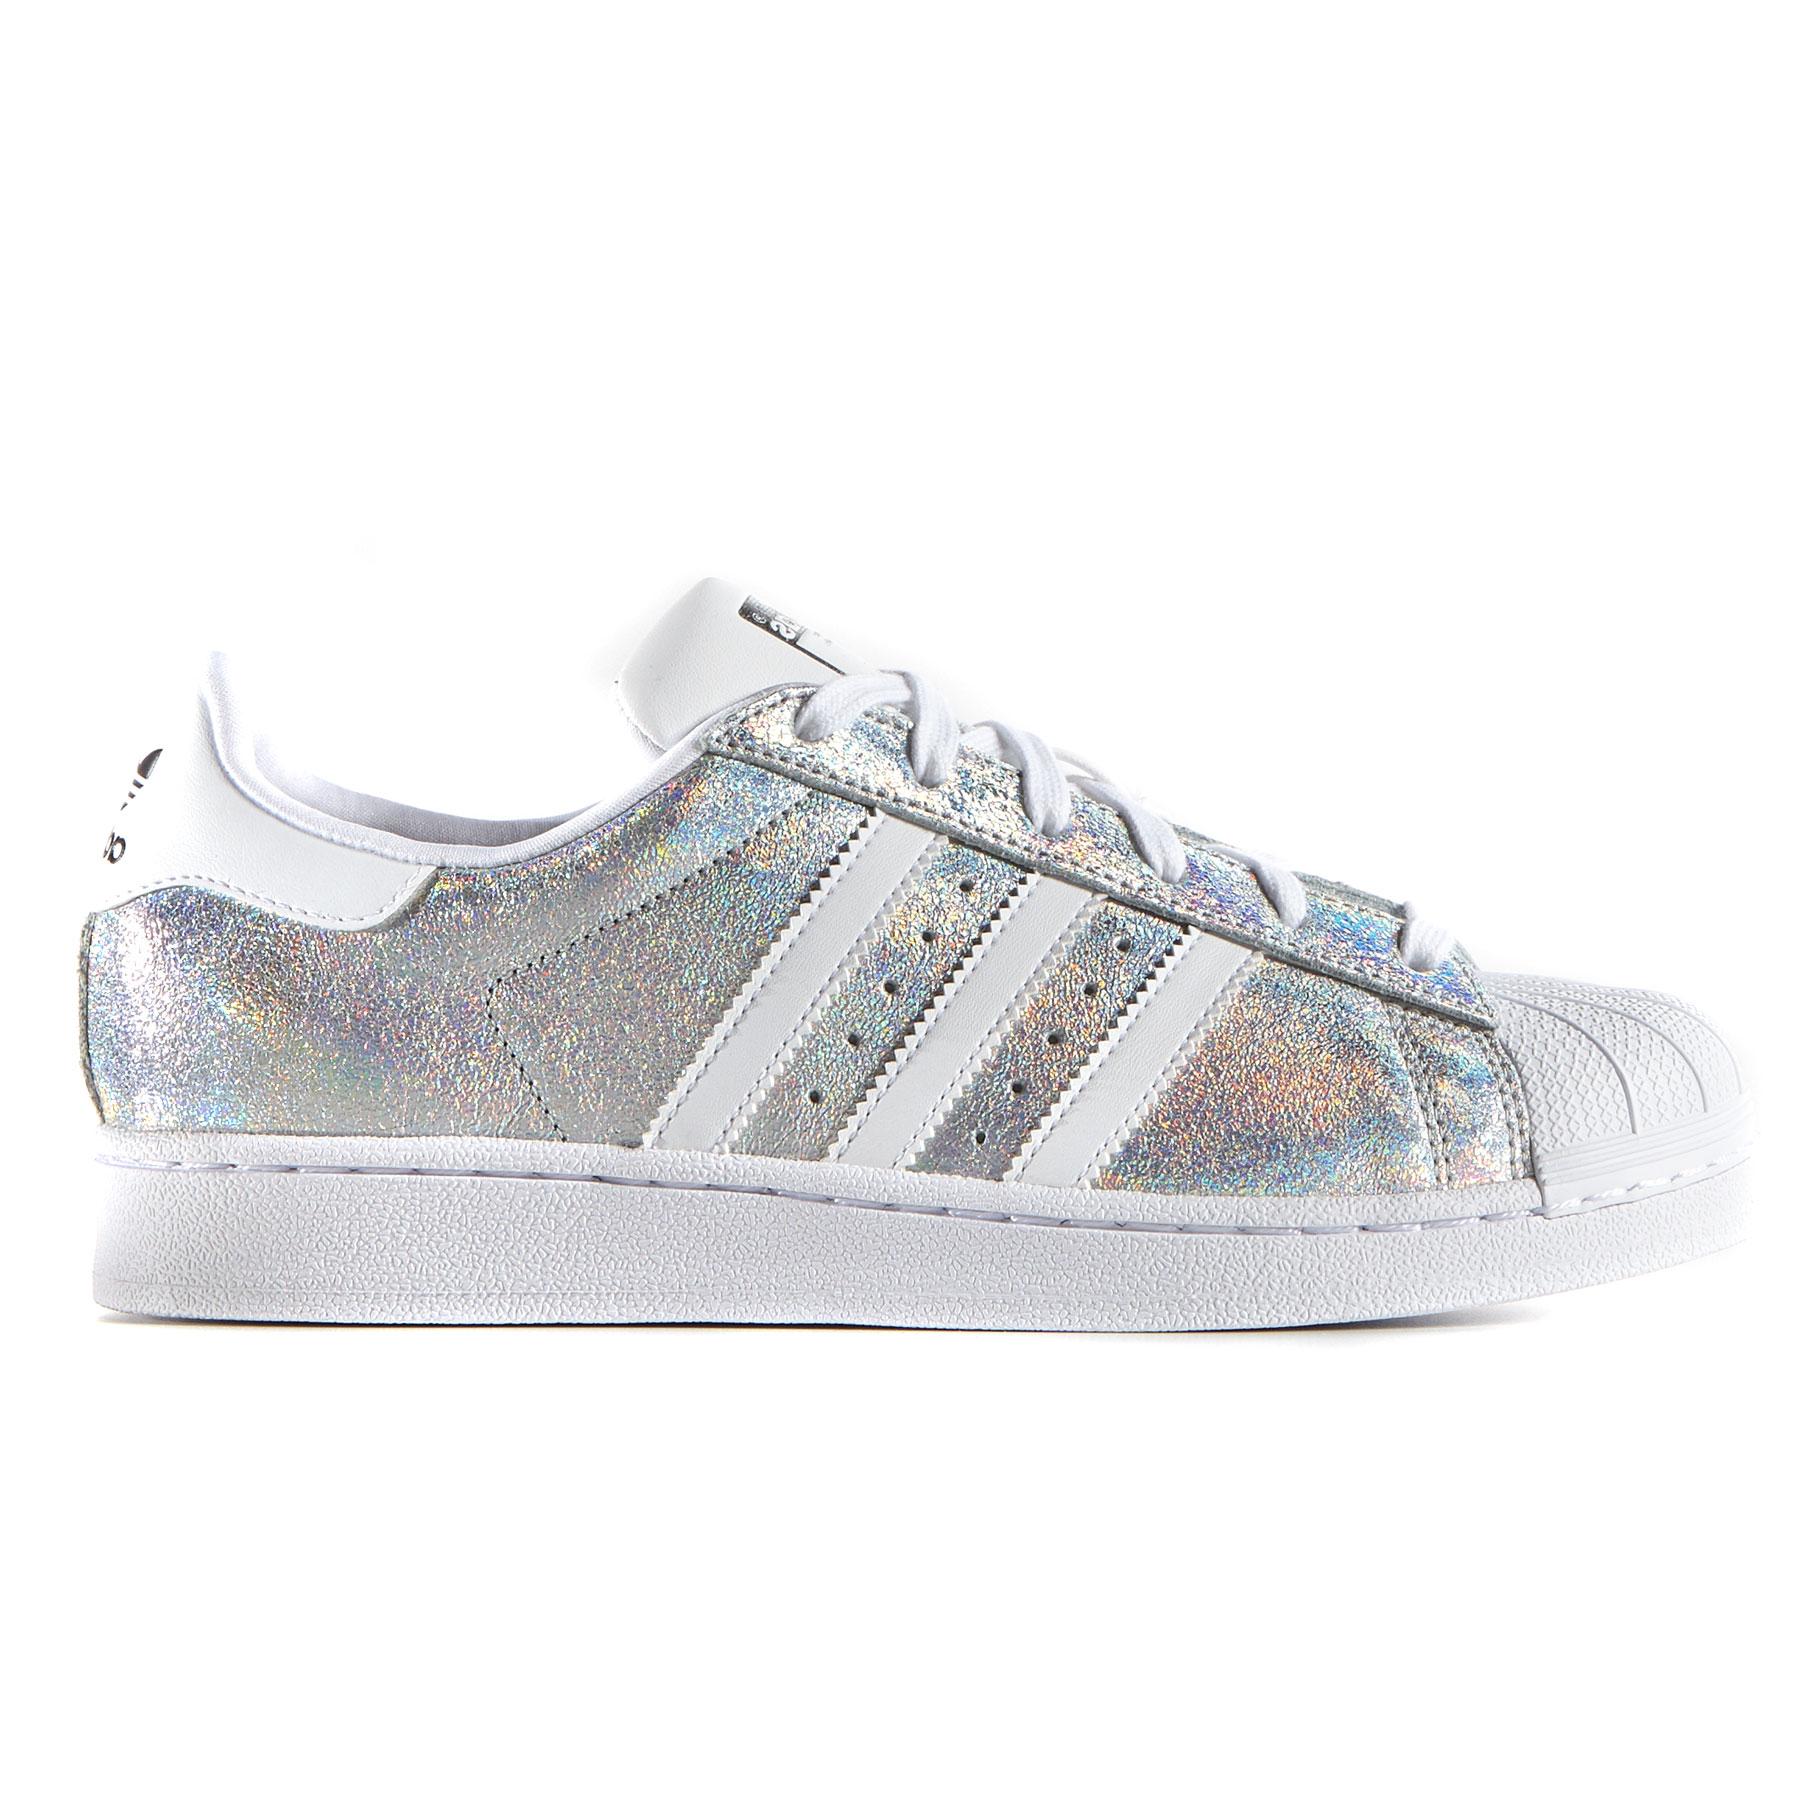 scarpe adidas donna superstar nere con le strisce bianche